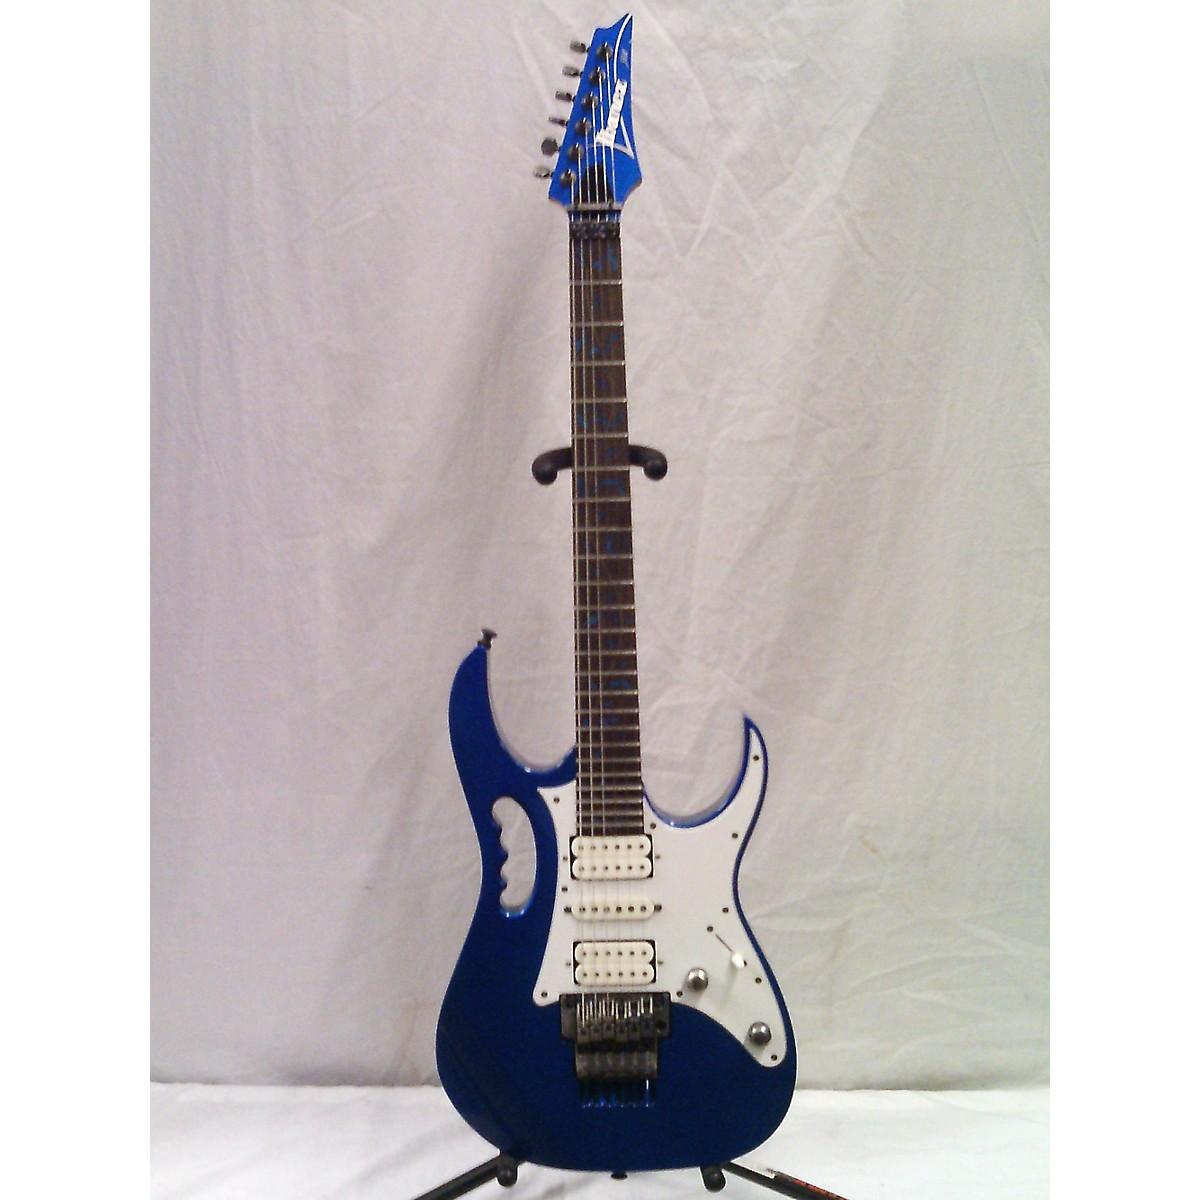 Ibanez 2002 JEM7V Steve Vai Signature Electric Guitar